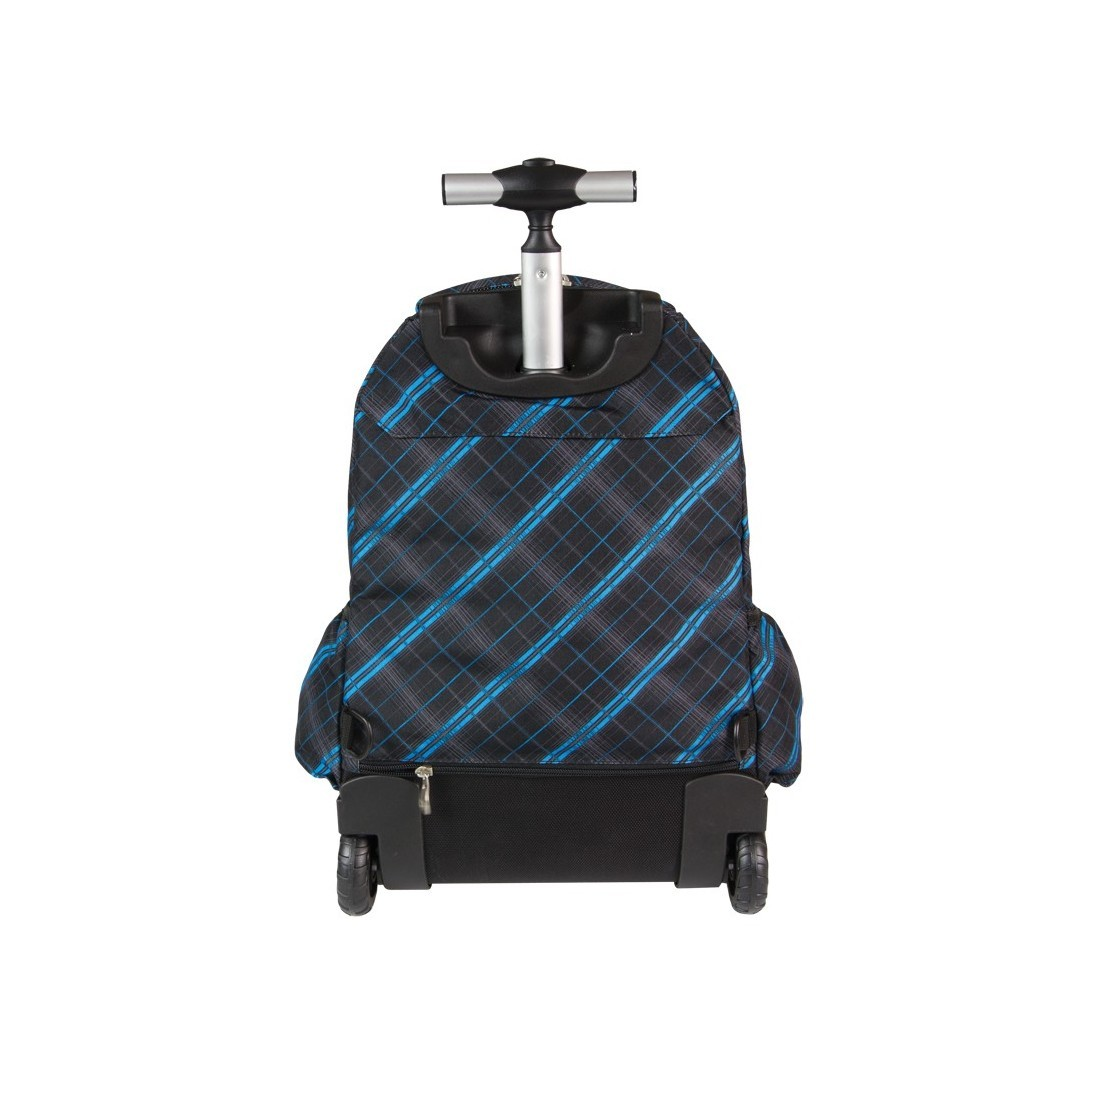 Plecak CoolPack na kółkach dla chłopca w kratkę - JUNIOR SCOTISH BLUE CP 342 - plecak-tornister.pl